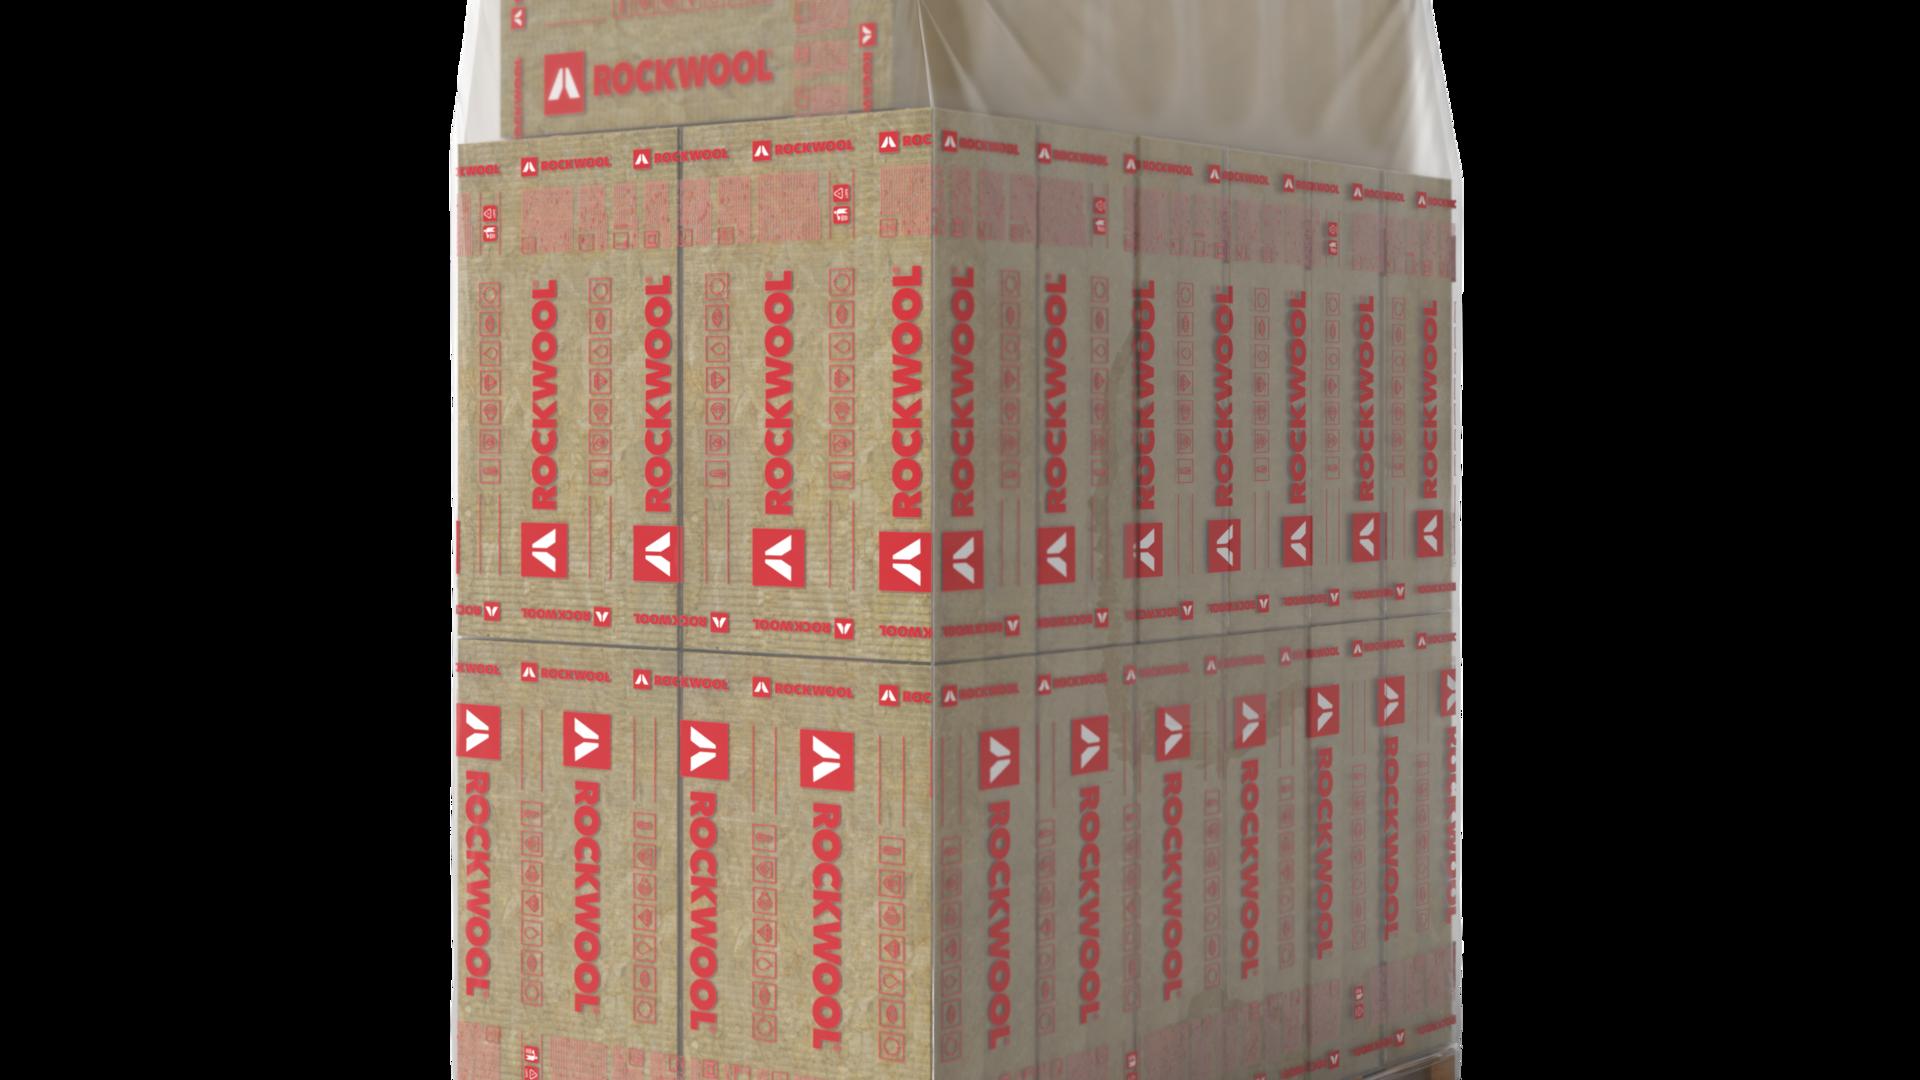 pallet, ewi, facade, products, external wall insulation, ventilated facade, ventirock